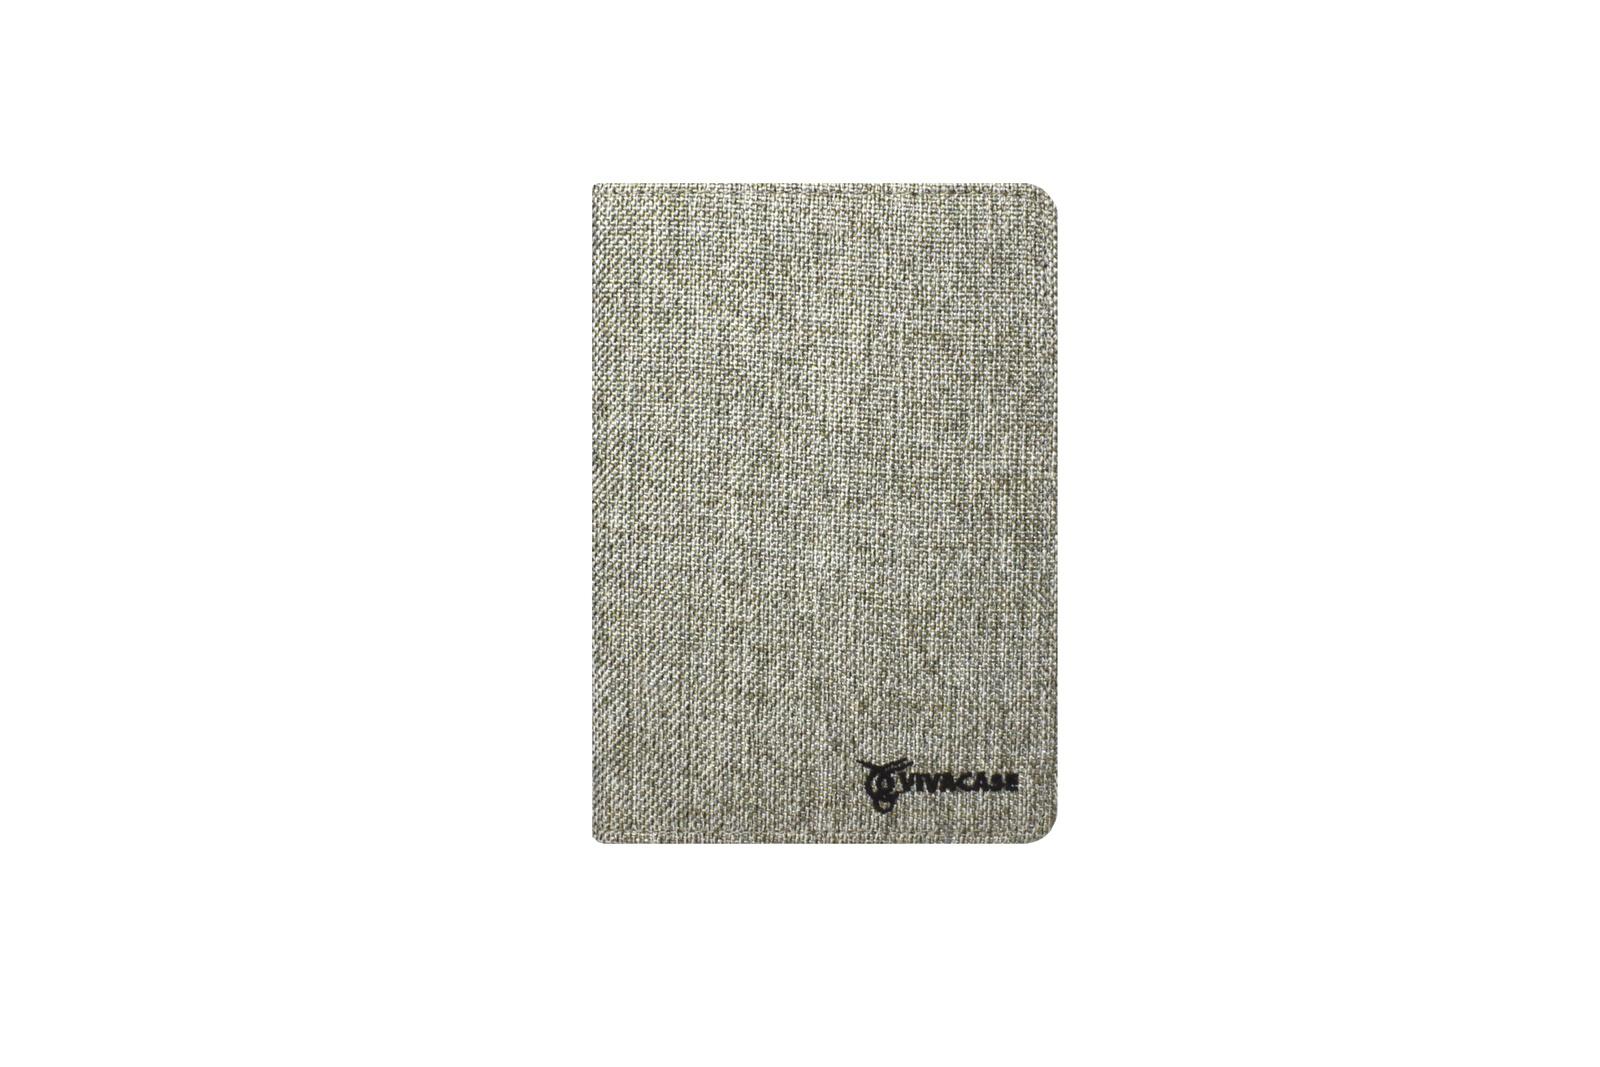 Чехол для электронной книги Vivacase VDG-6ZHAKKARDGR, серый